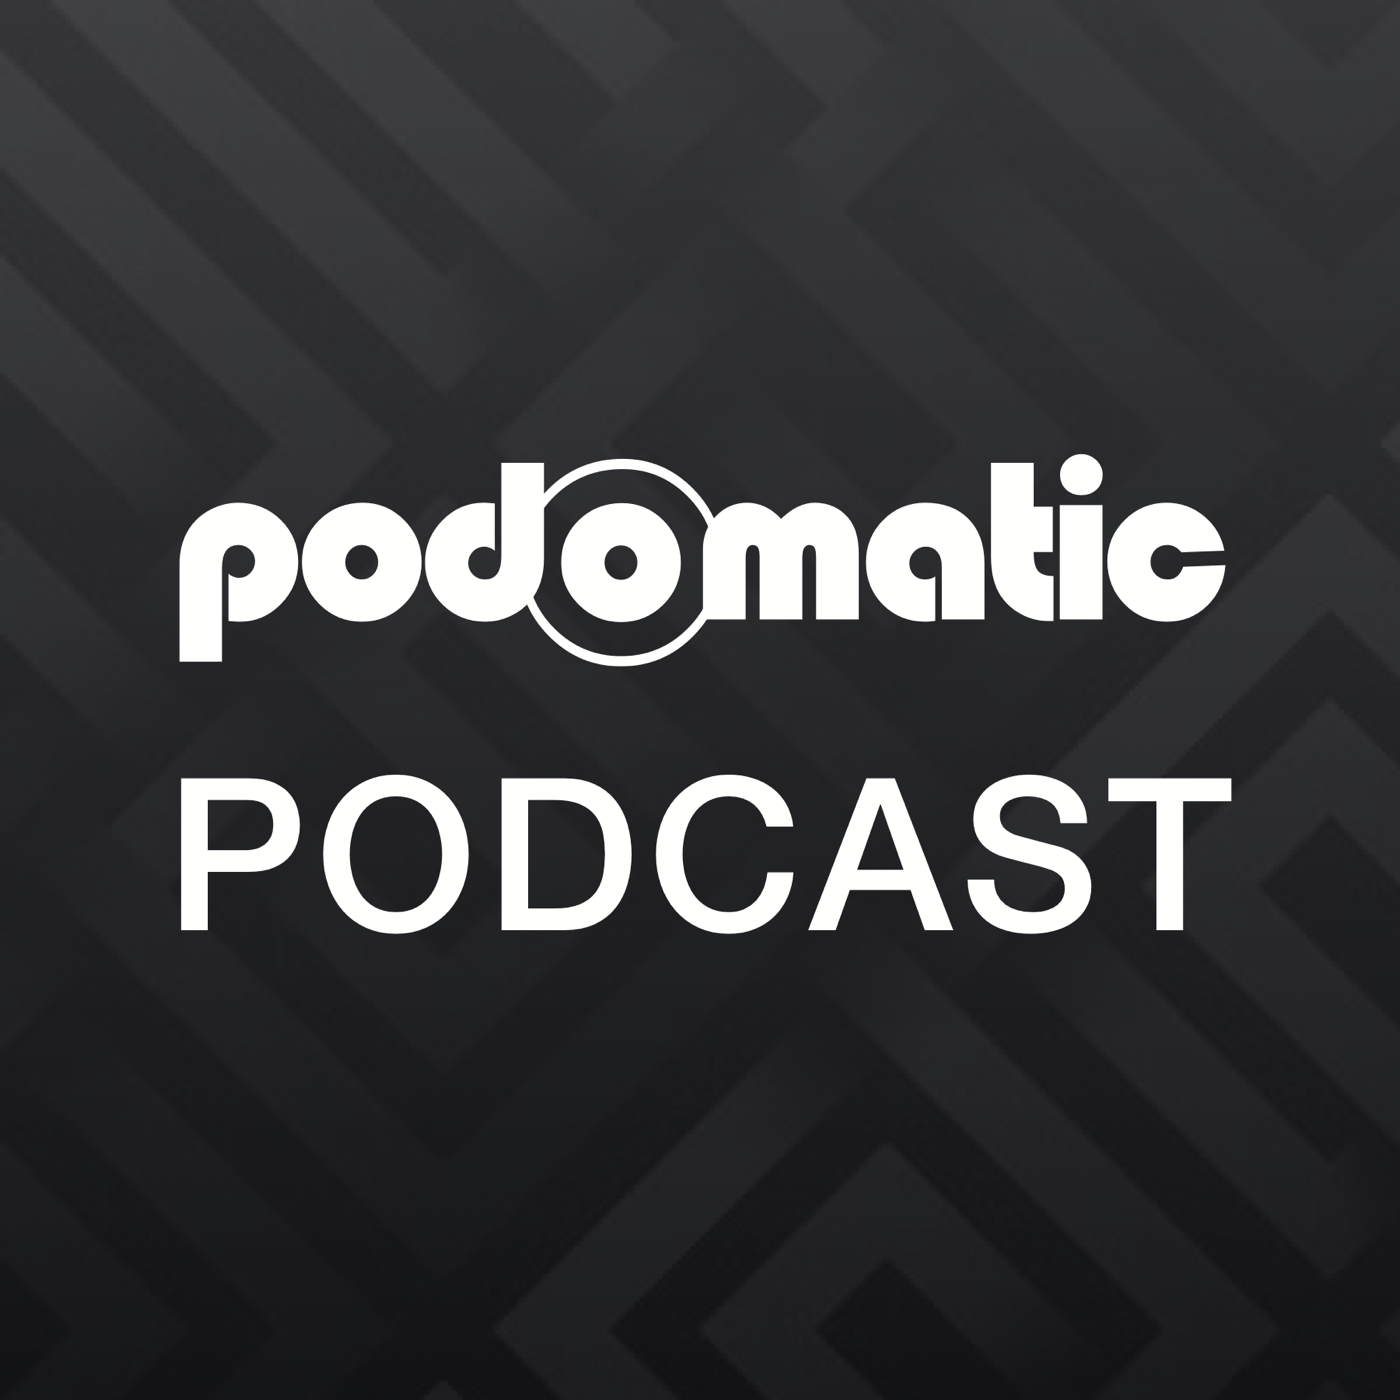 VozCharra's Podcast